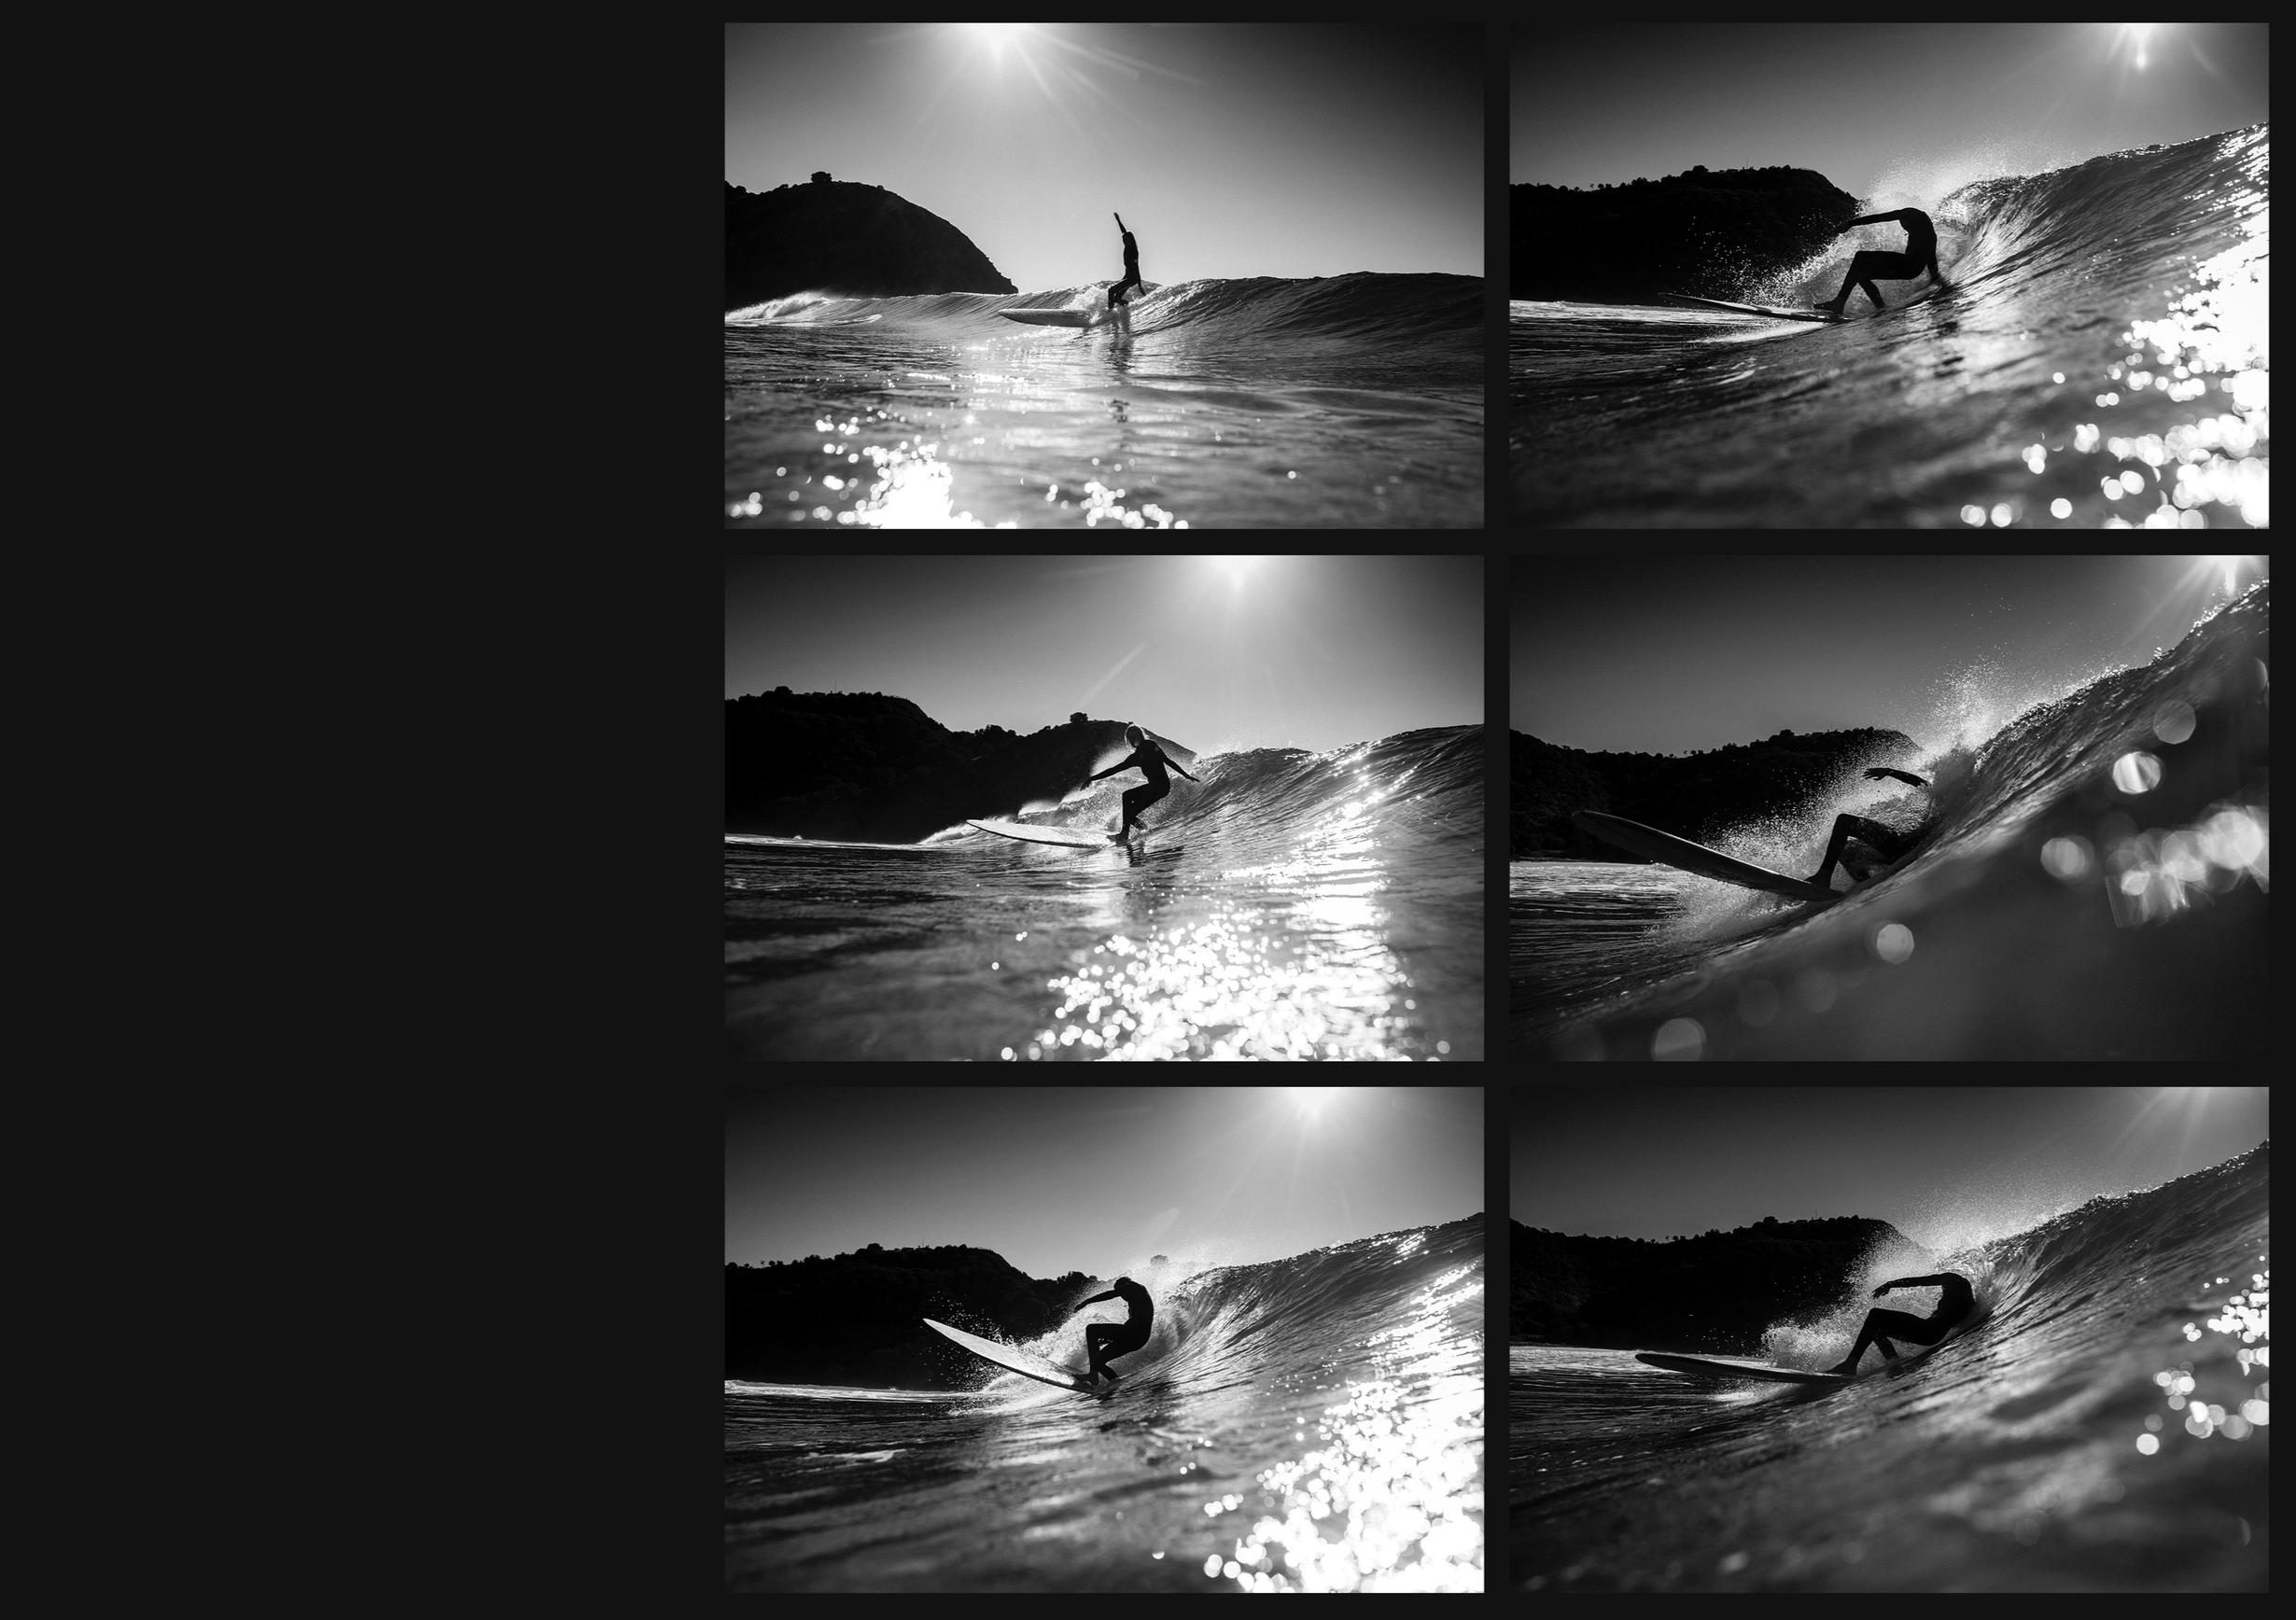 saltwater x fabien voileau x Jye Whyatt 5